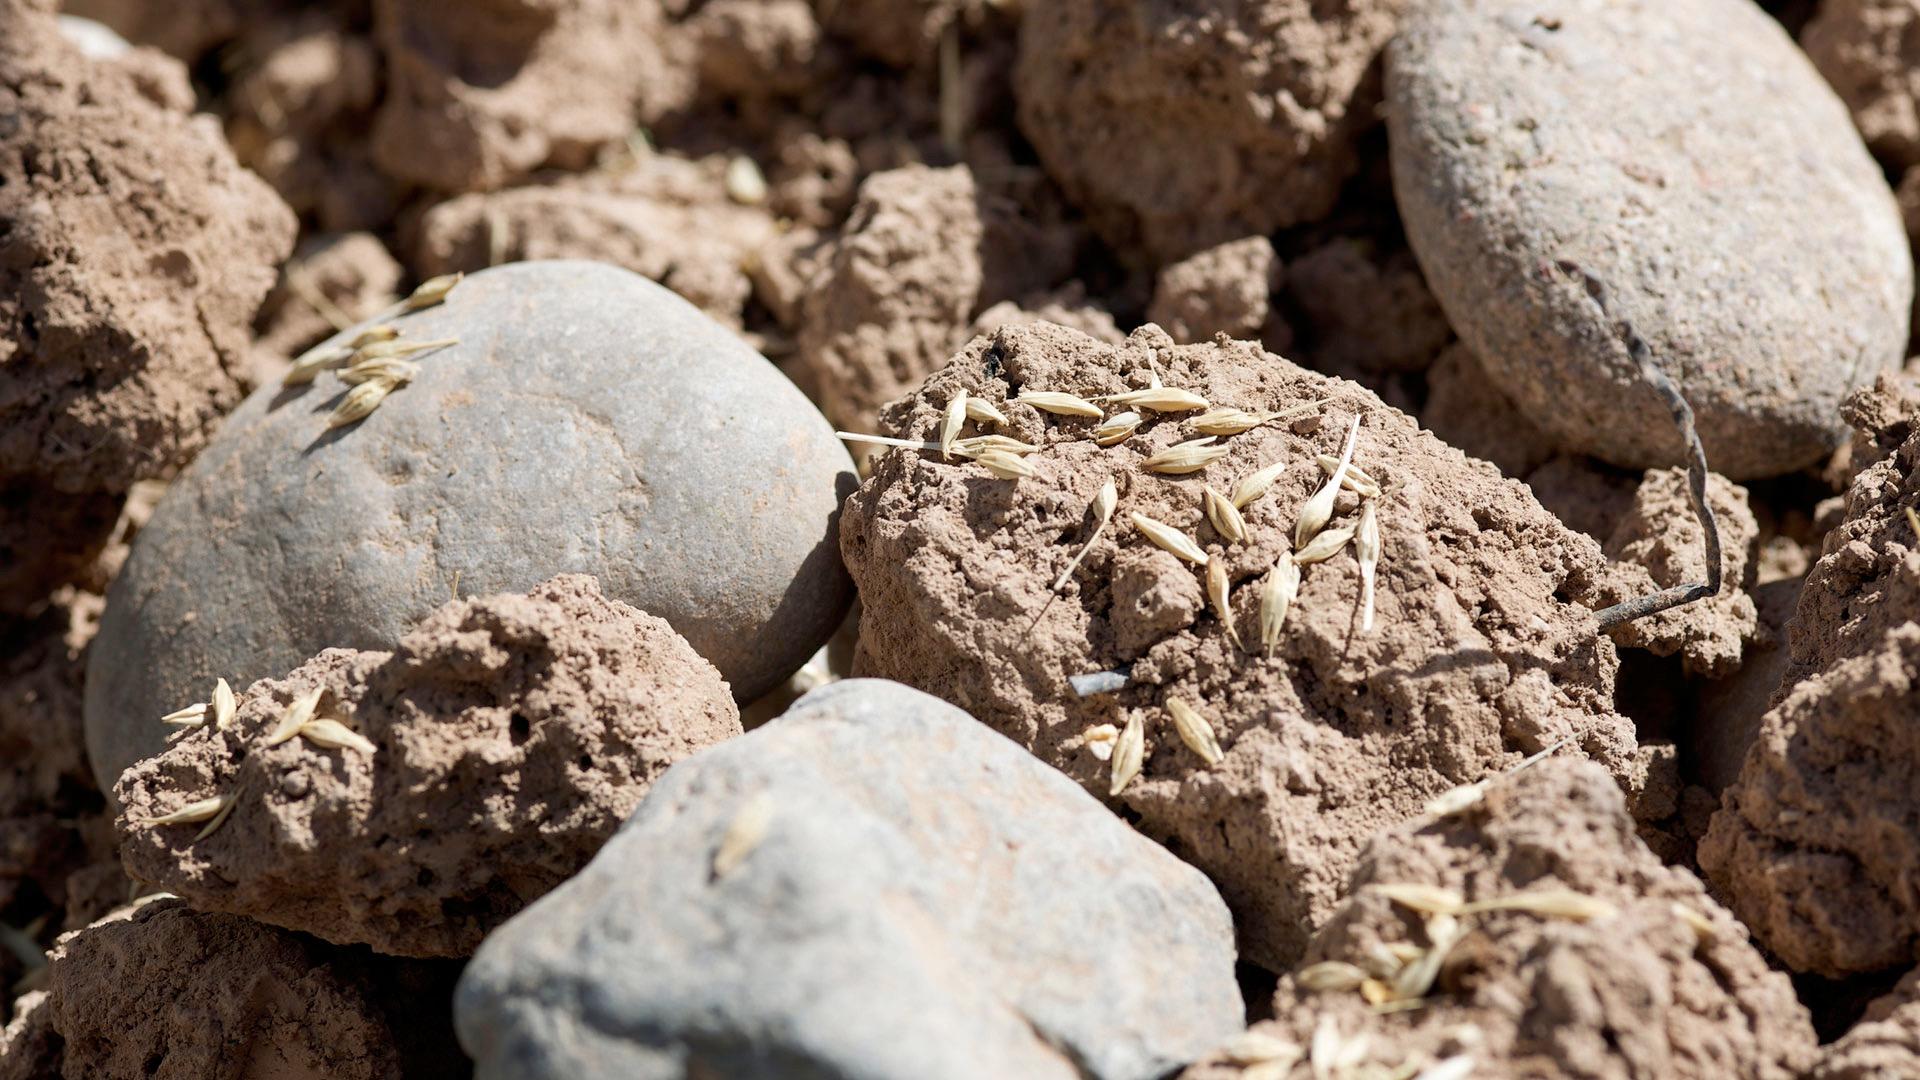 Grain cast onto a variety of soils